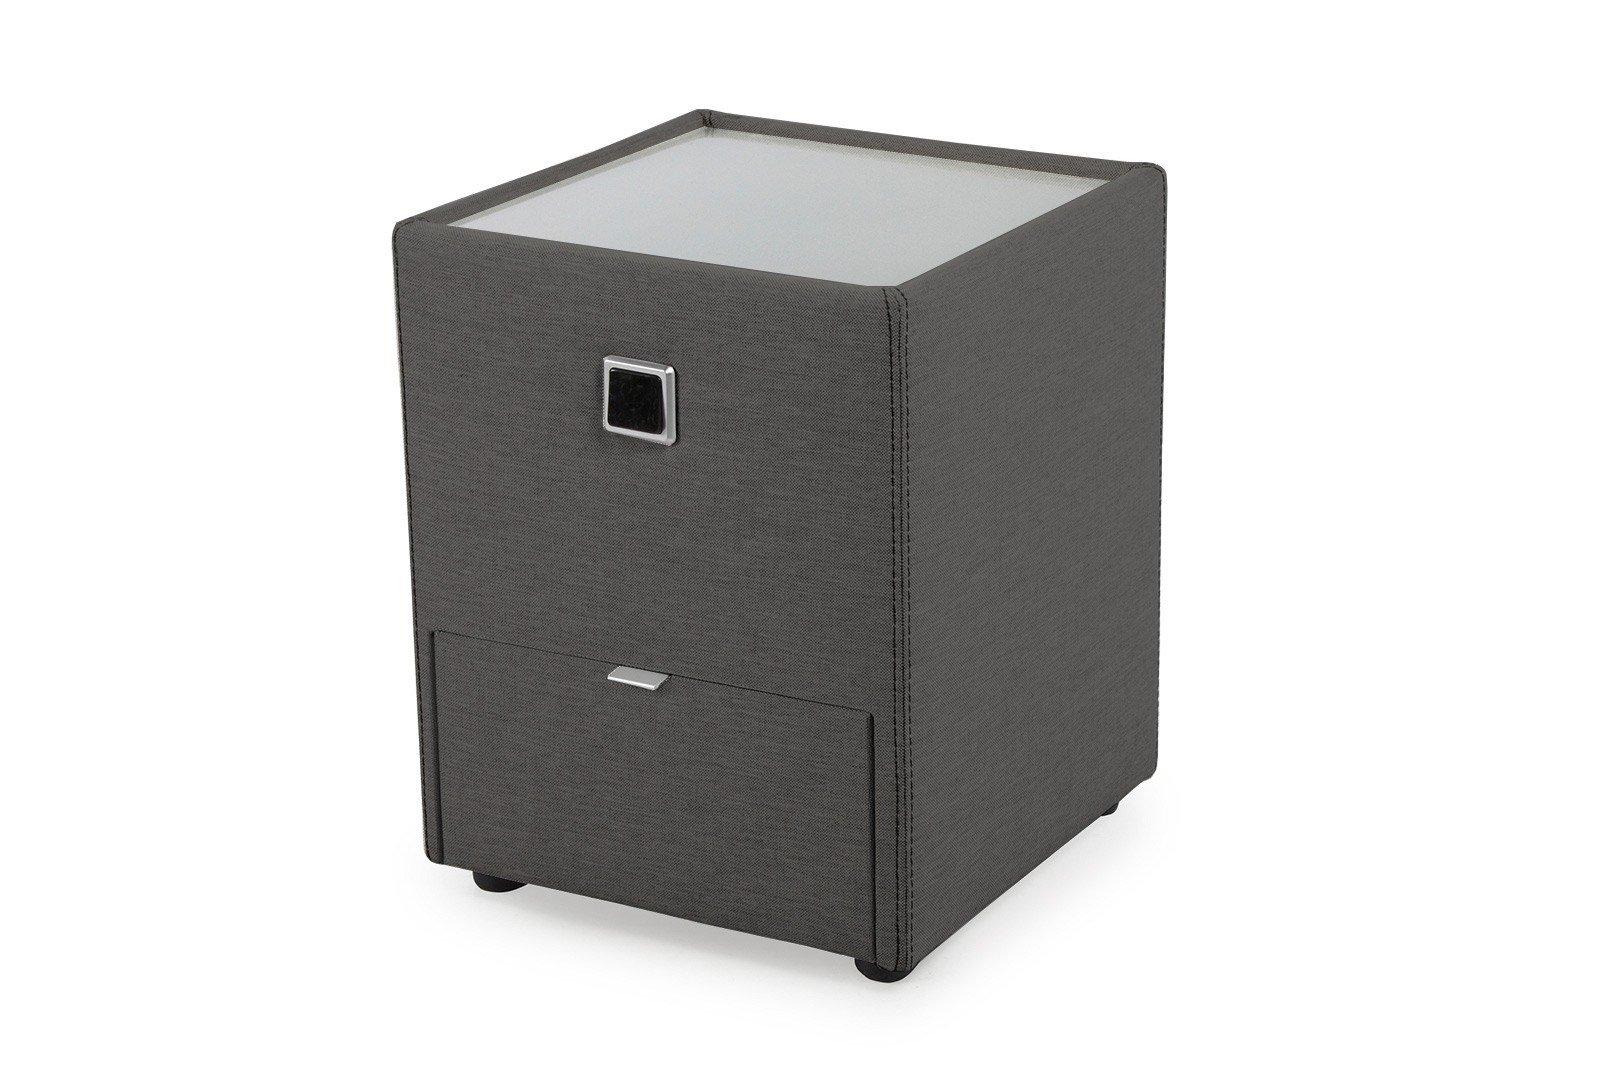 jockenh fer lancy nachtkonsole in grau mit beleuchtung und. Black Bedroom Furniture Sets. Home Design Ideas